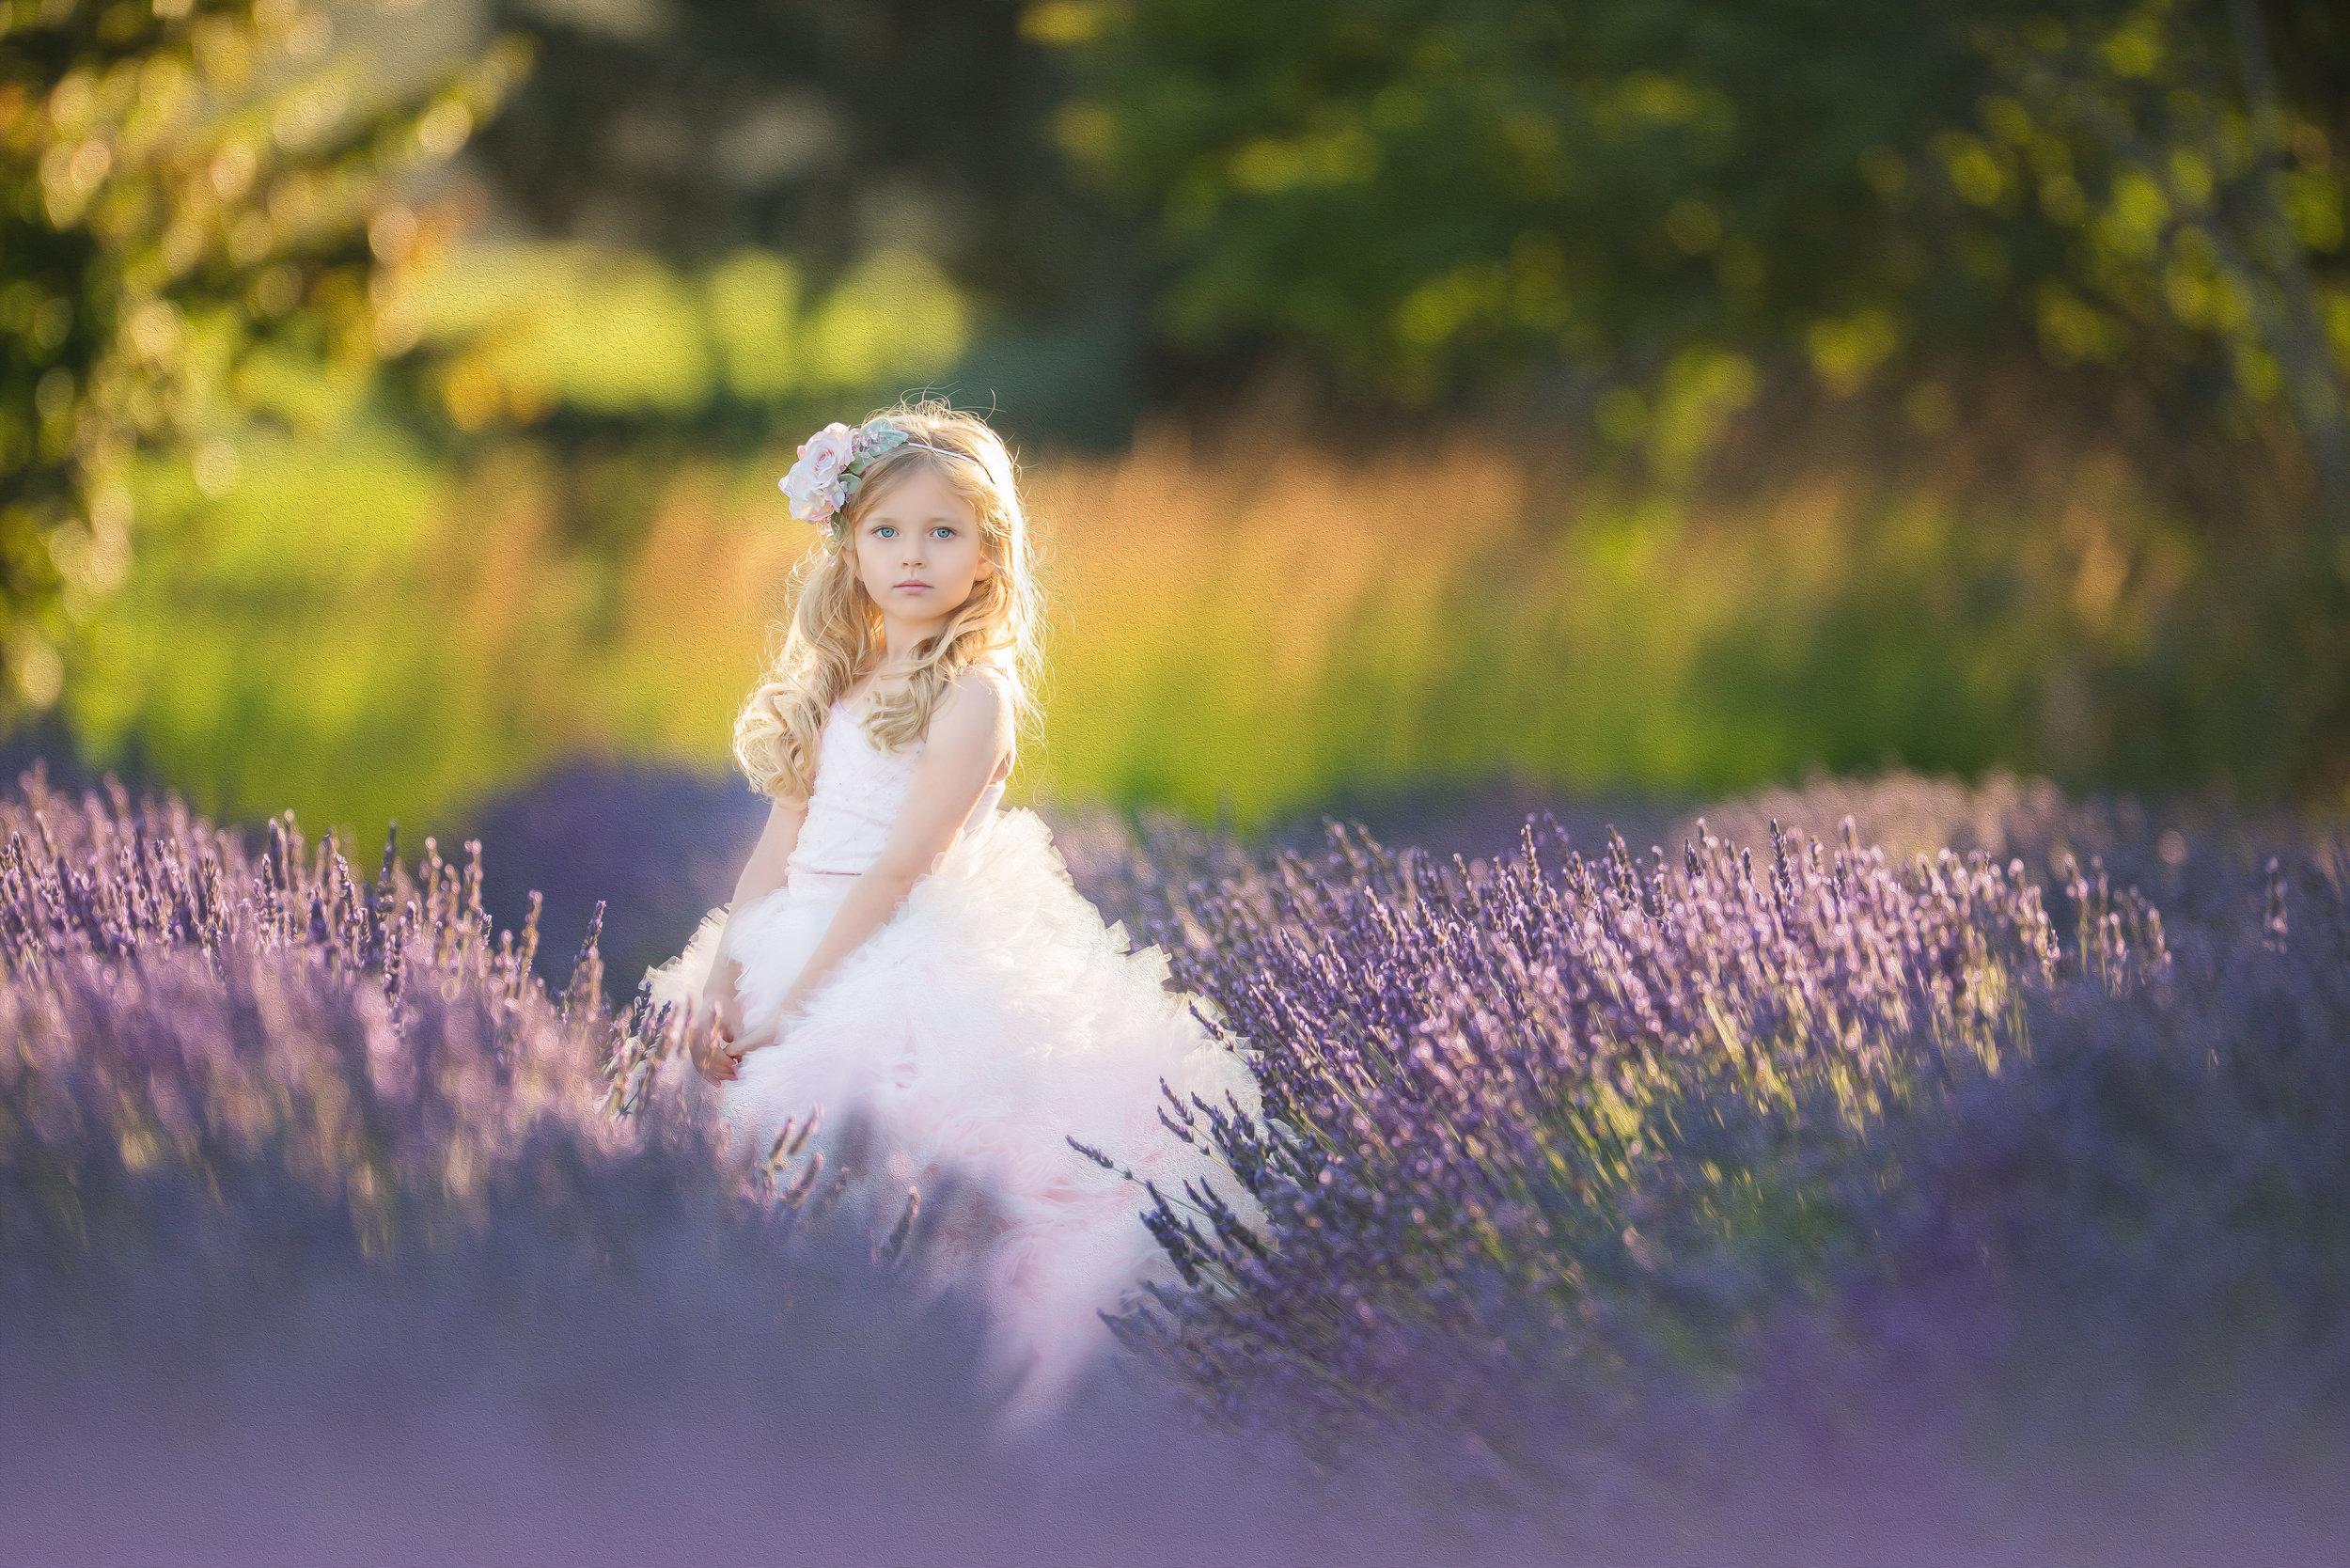 portrait in lavender filed